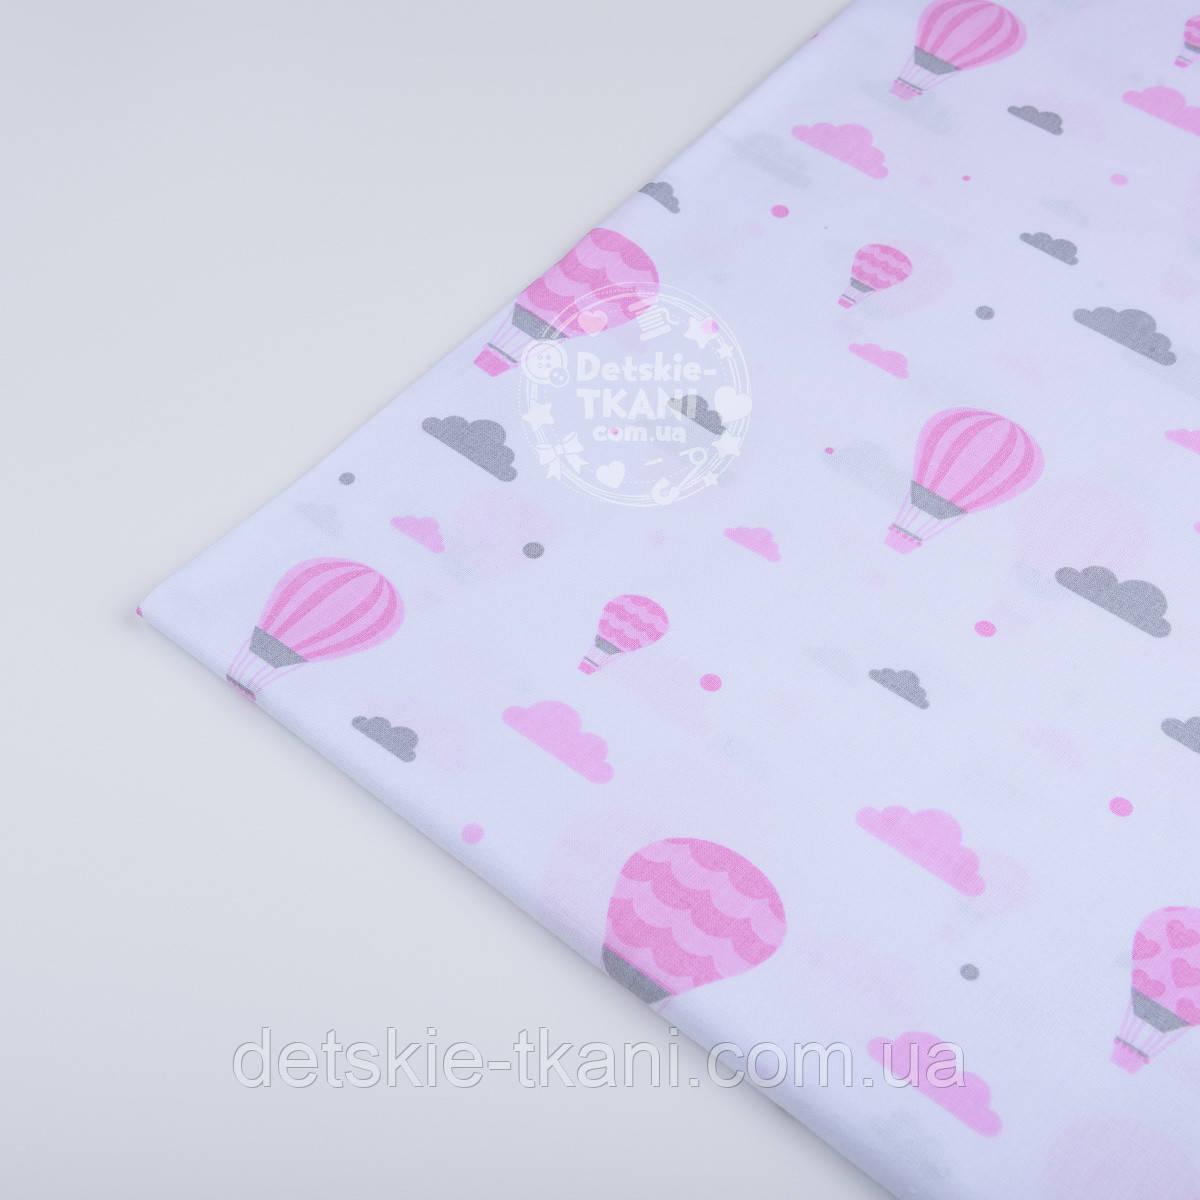 Лоскут ткани №845 размером 38*80см